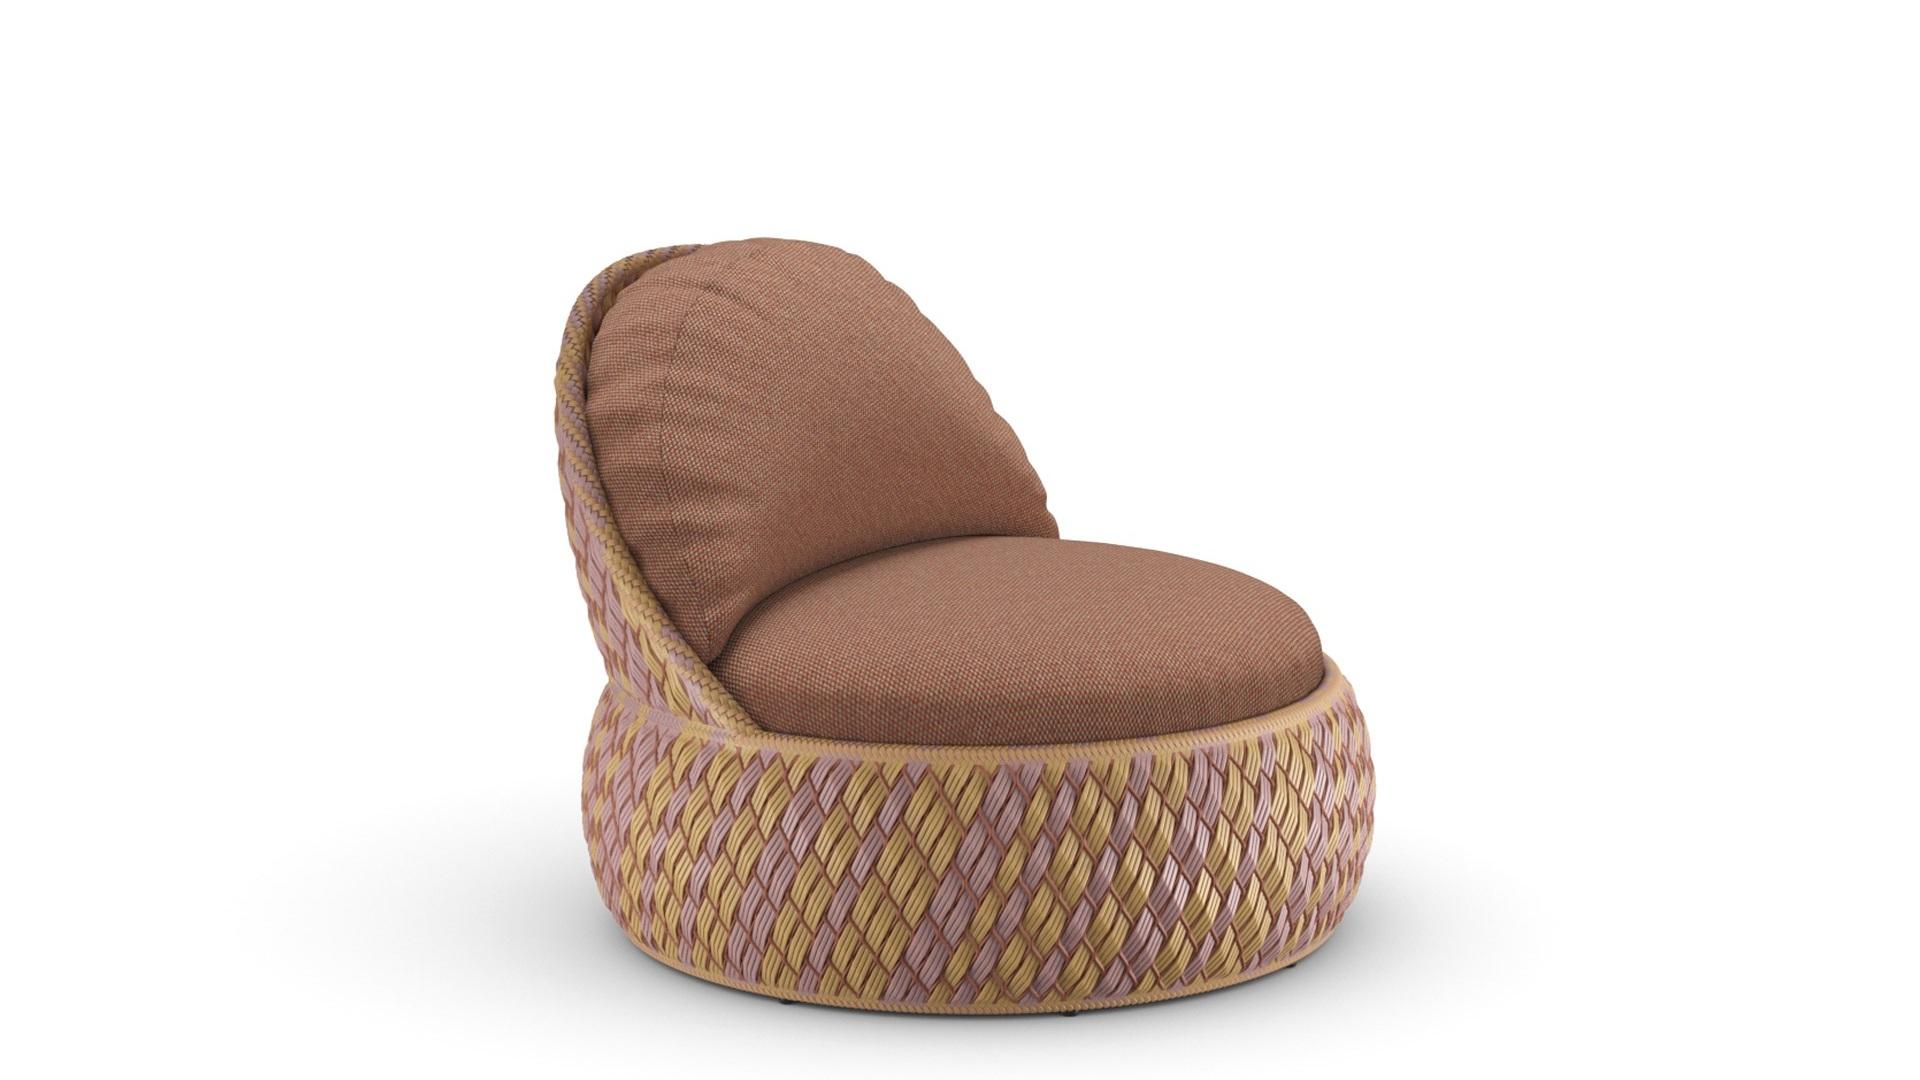 DEDON-DALA-Lounge-chair-cuba-cool-marsala.jpg